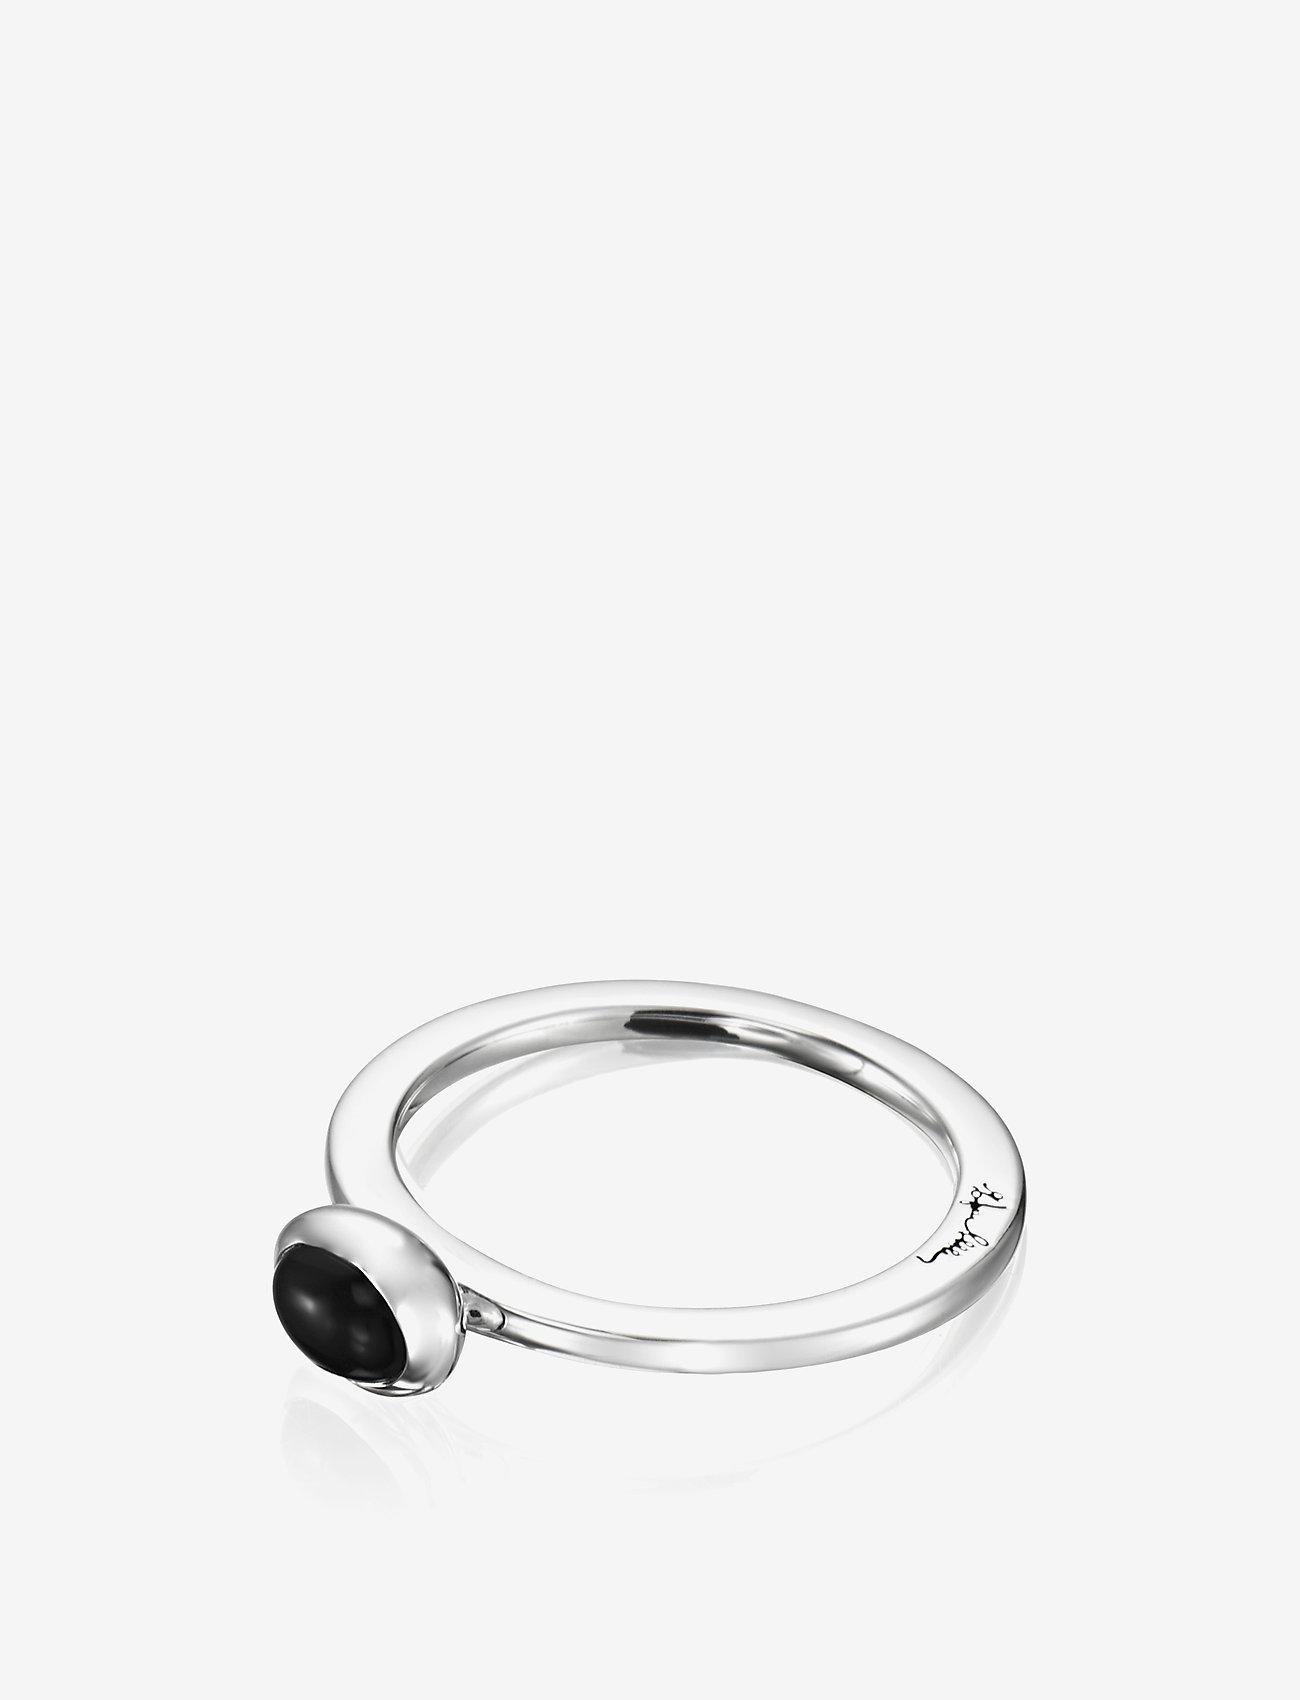 Efva Attling Love Bead Ring Silver - Onyx - Biżuteria SILVER - Akcesoria